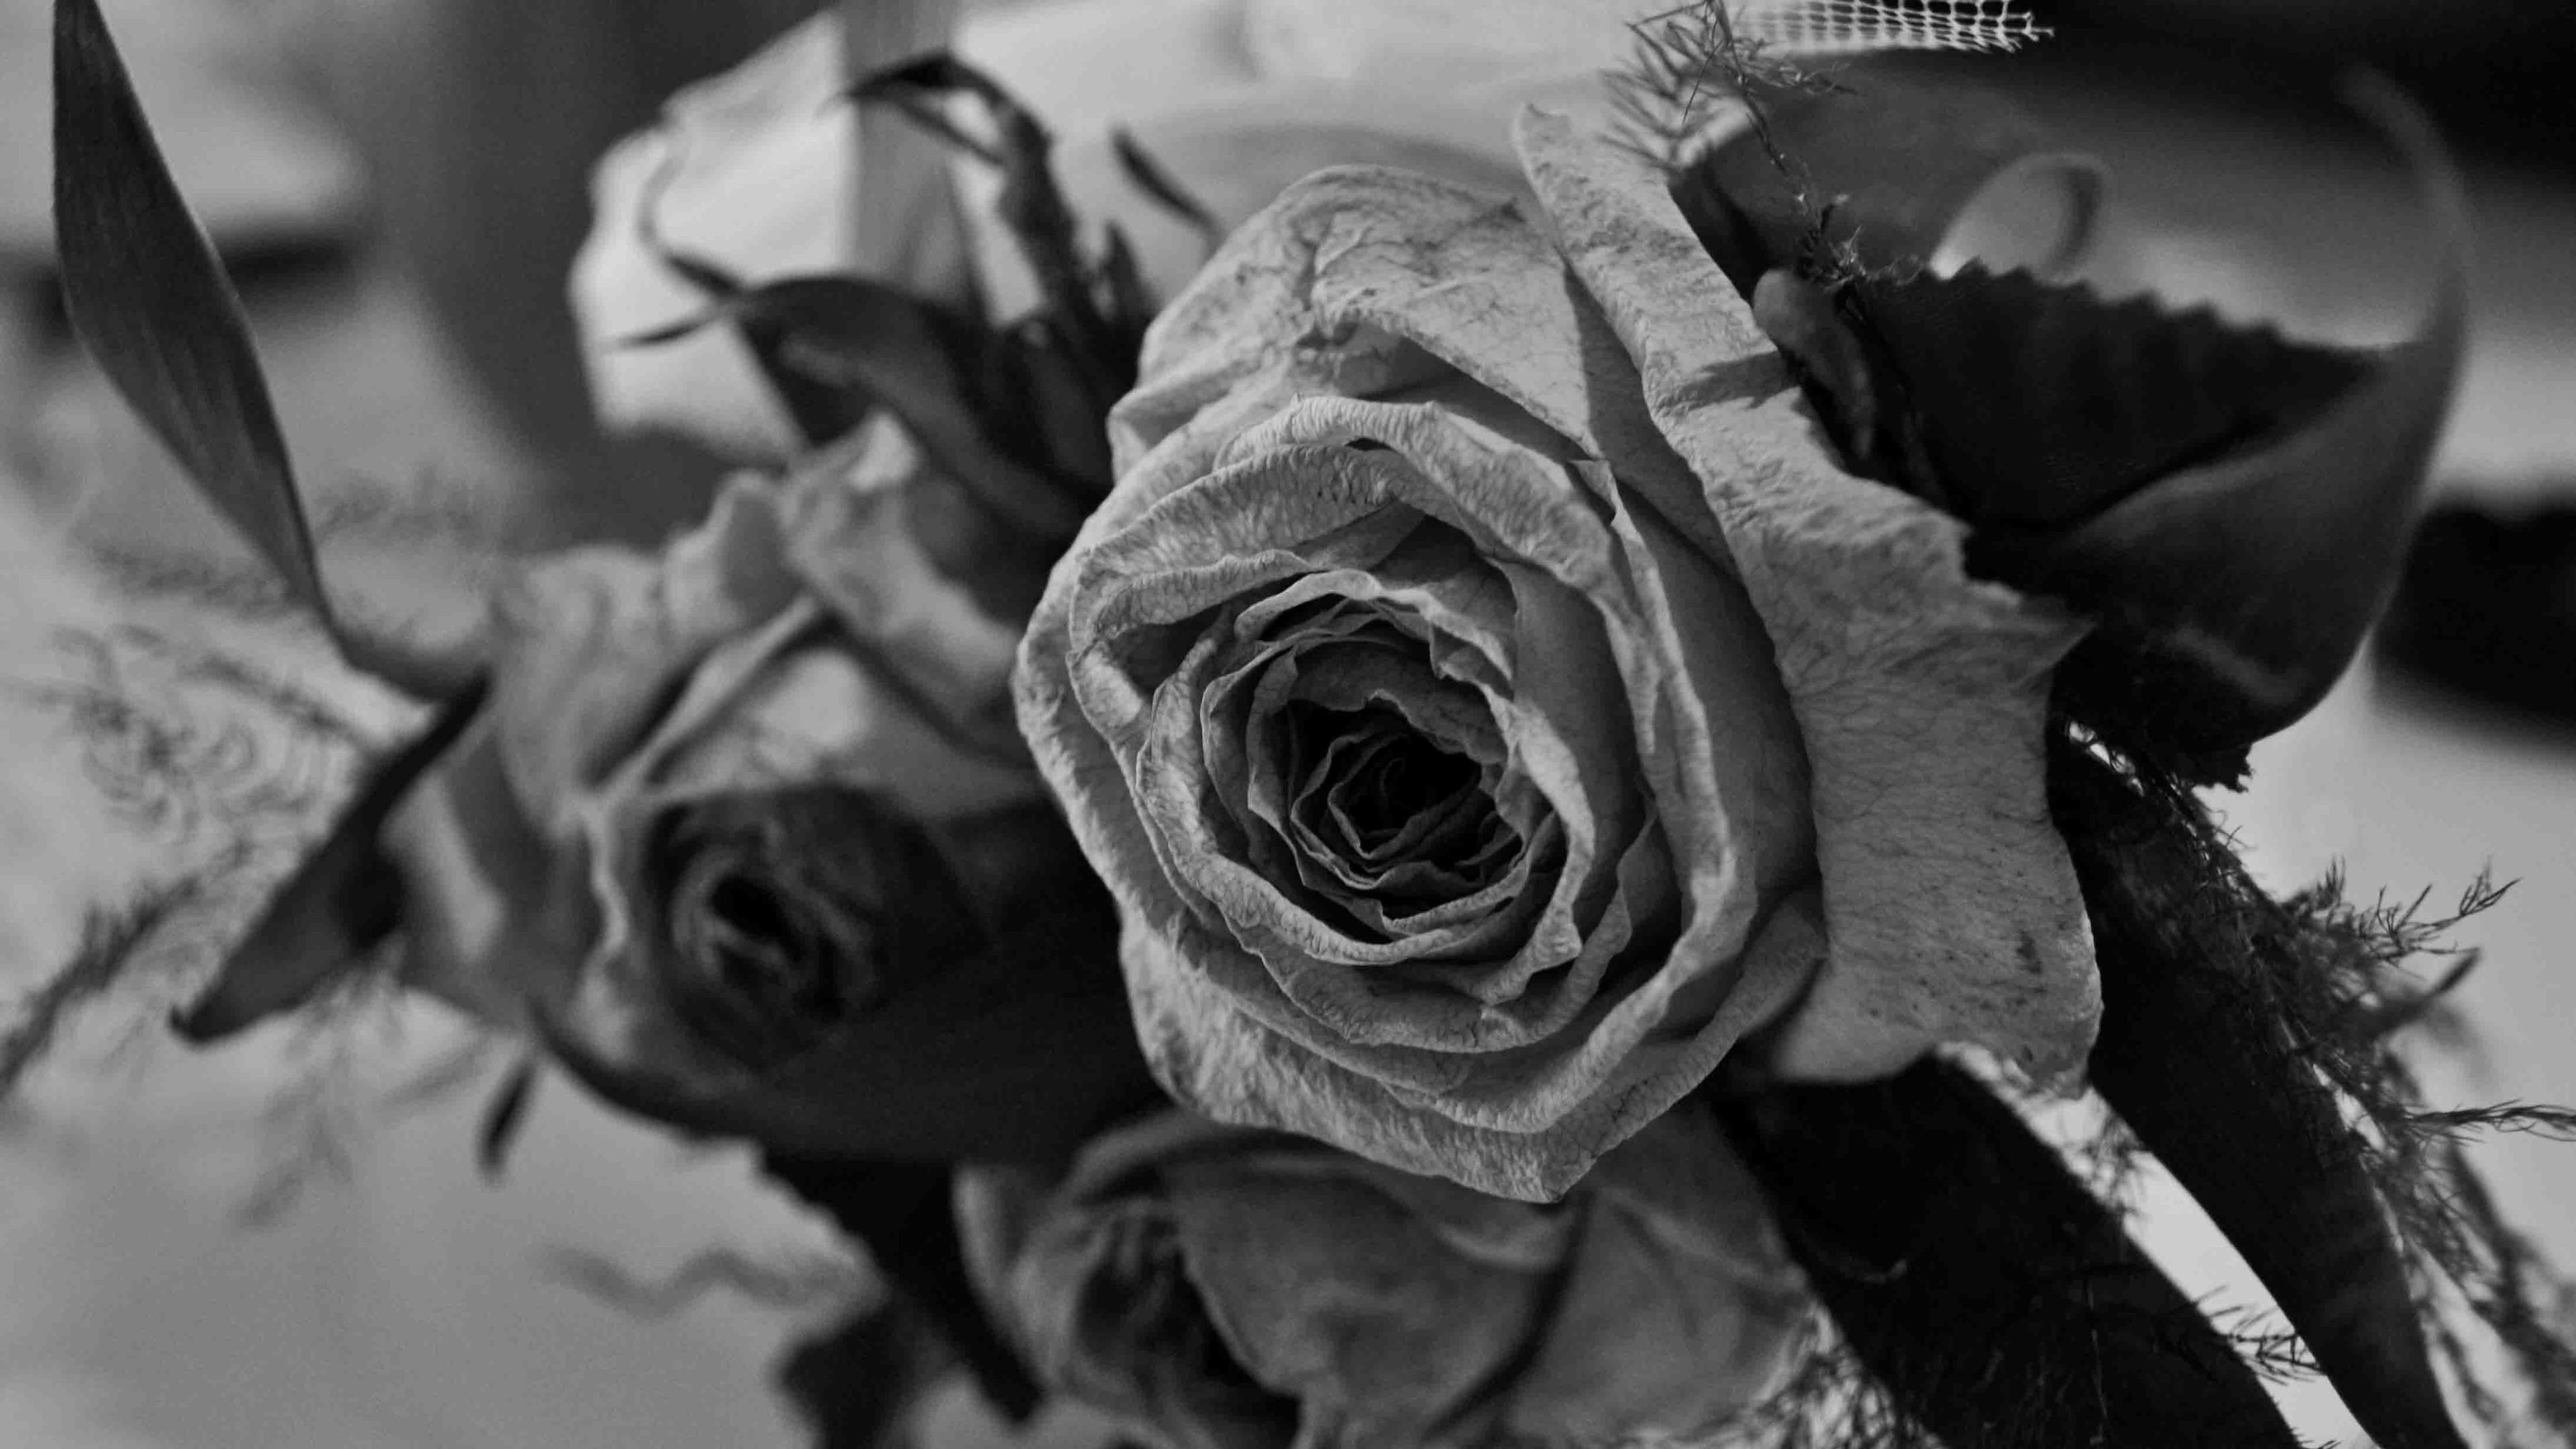 Black rose ultra hd wallpaper free download.